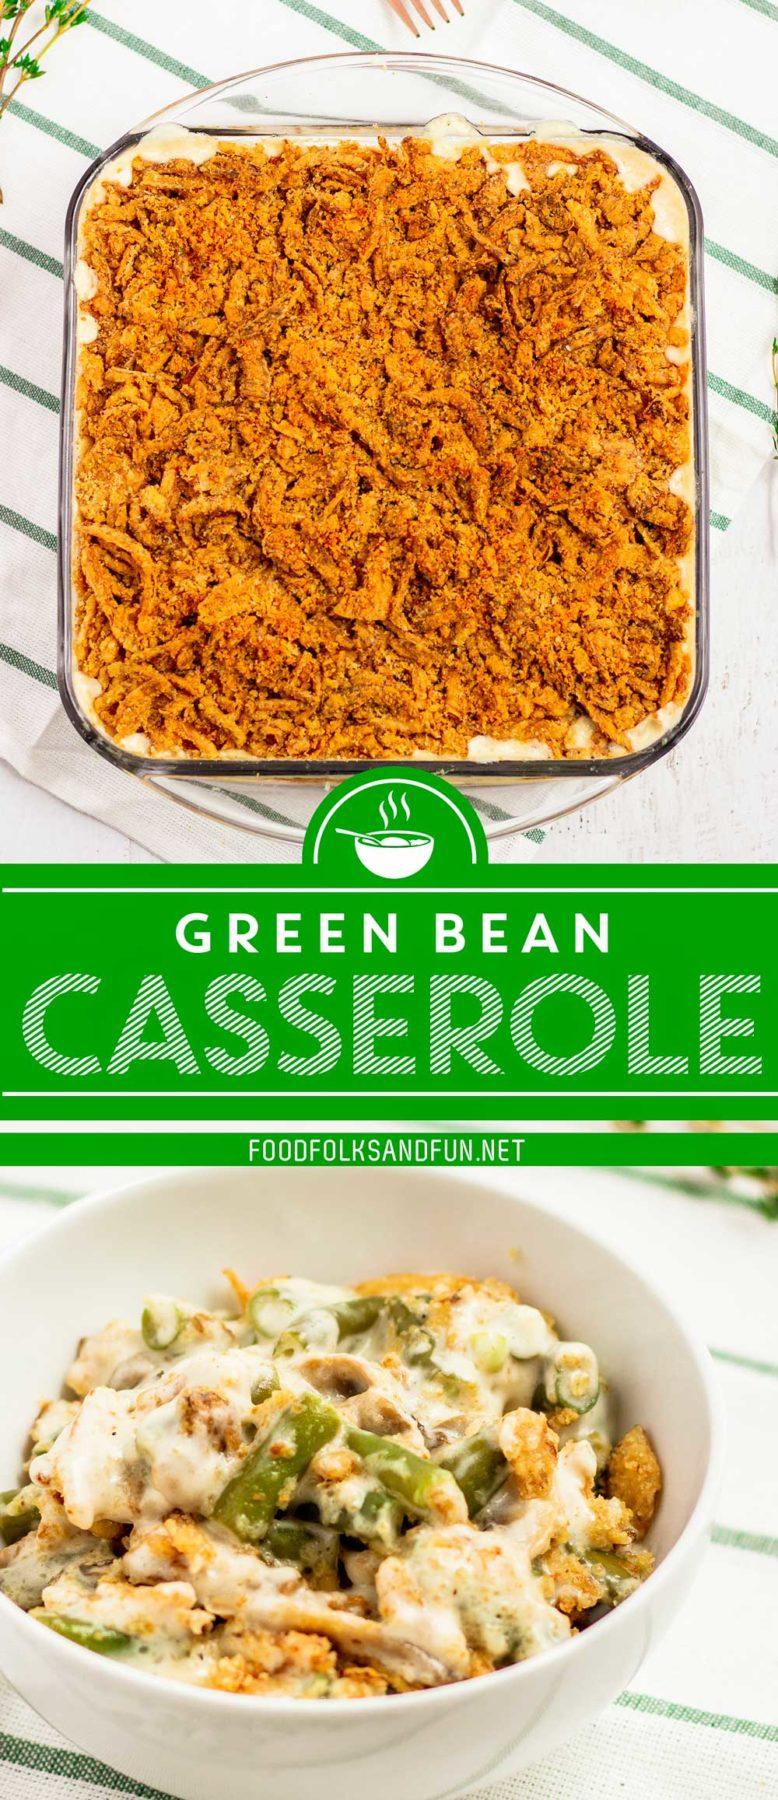 Make Ahead Green Bean Casserole recipe